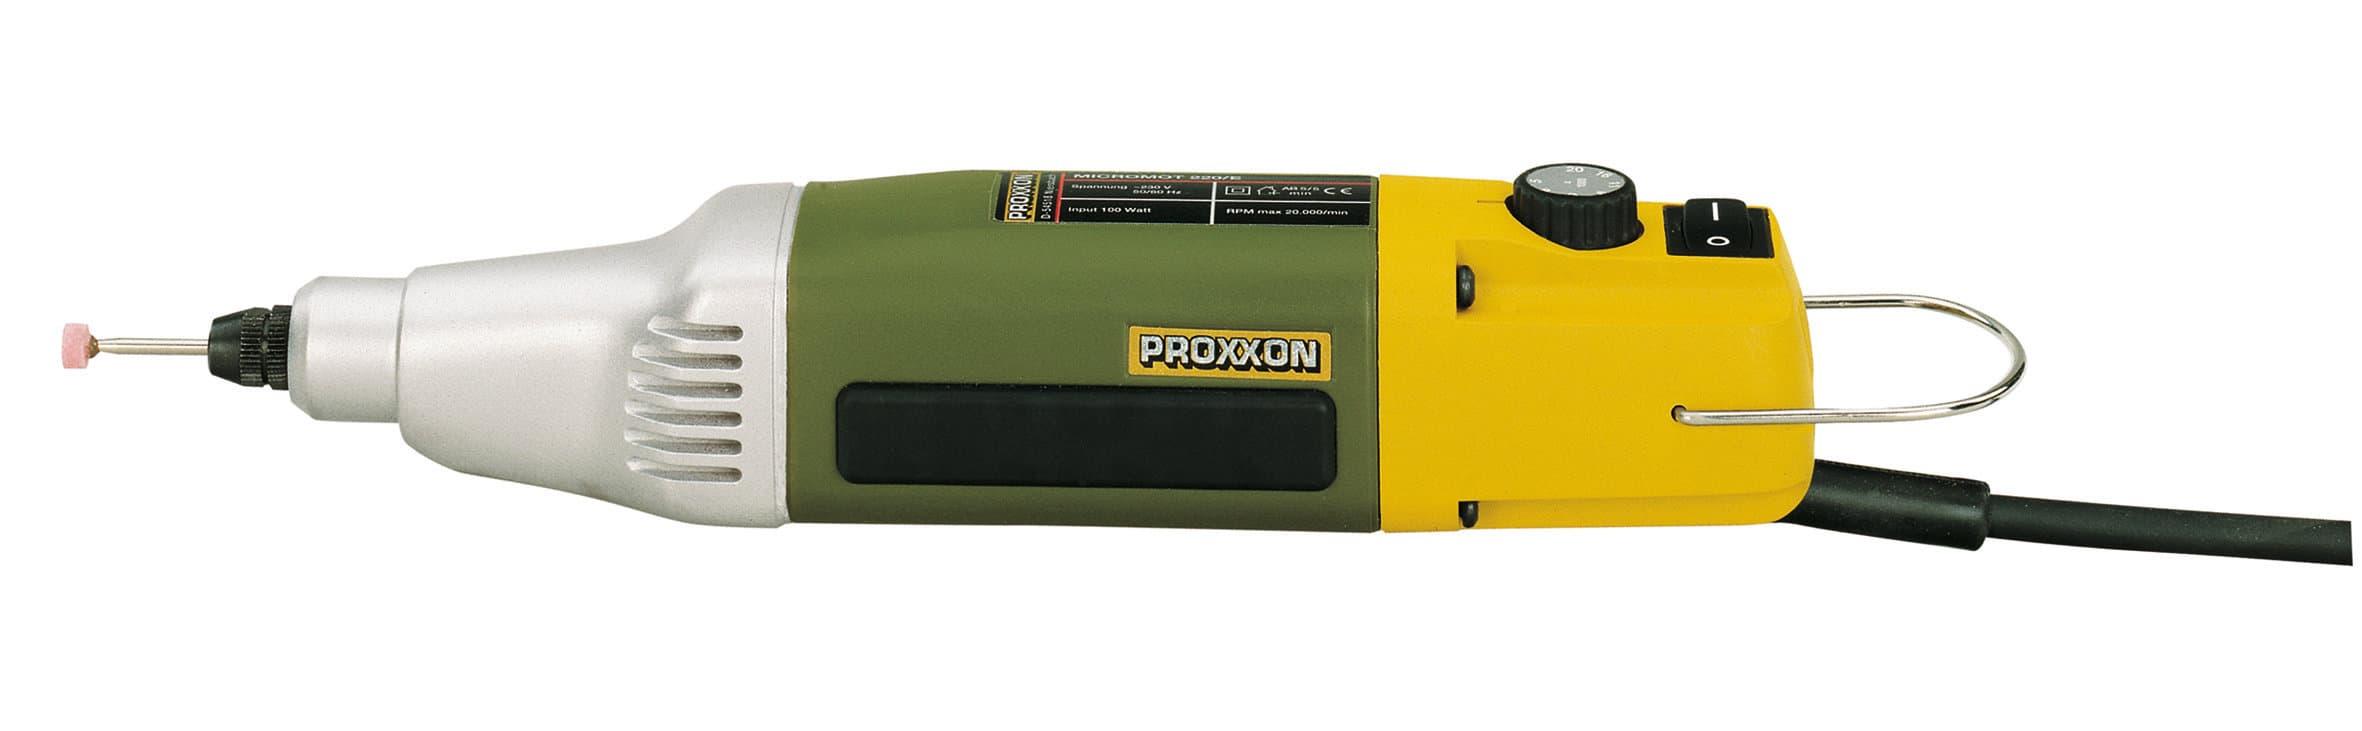 Proxxon MICROMOT Bohrschleifer IB/E Multifunktionswerkzeuge